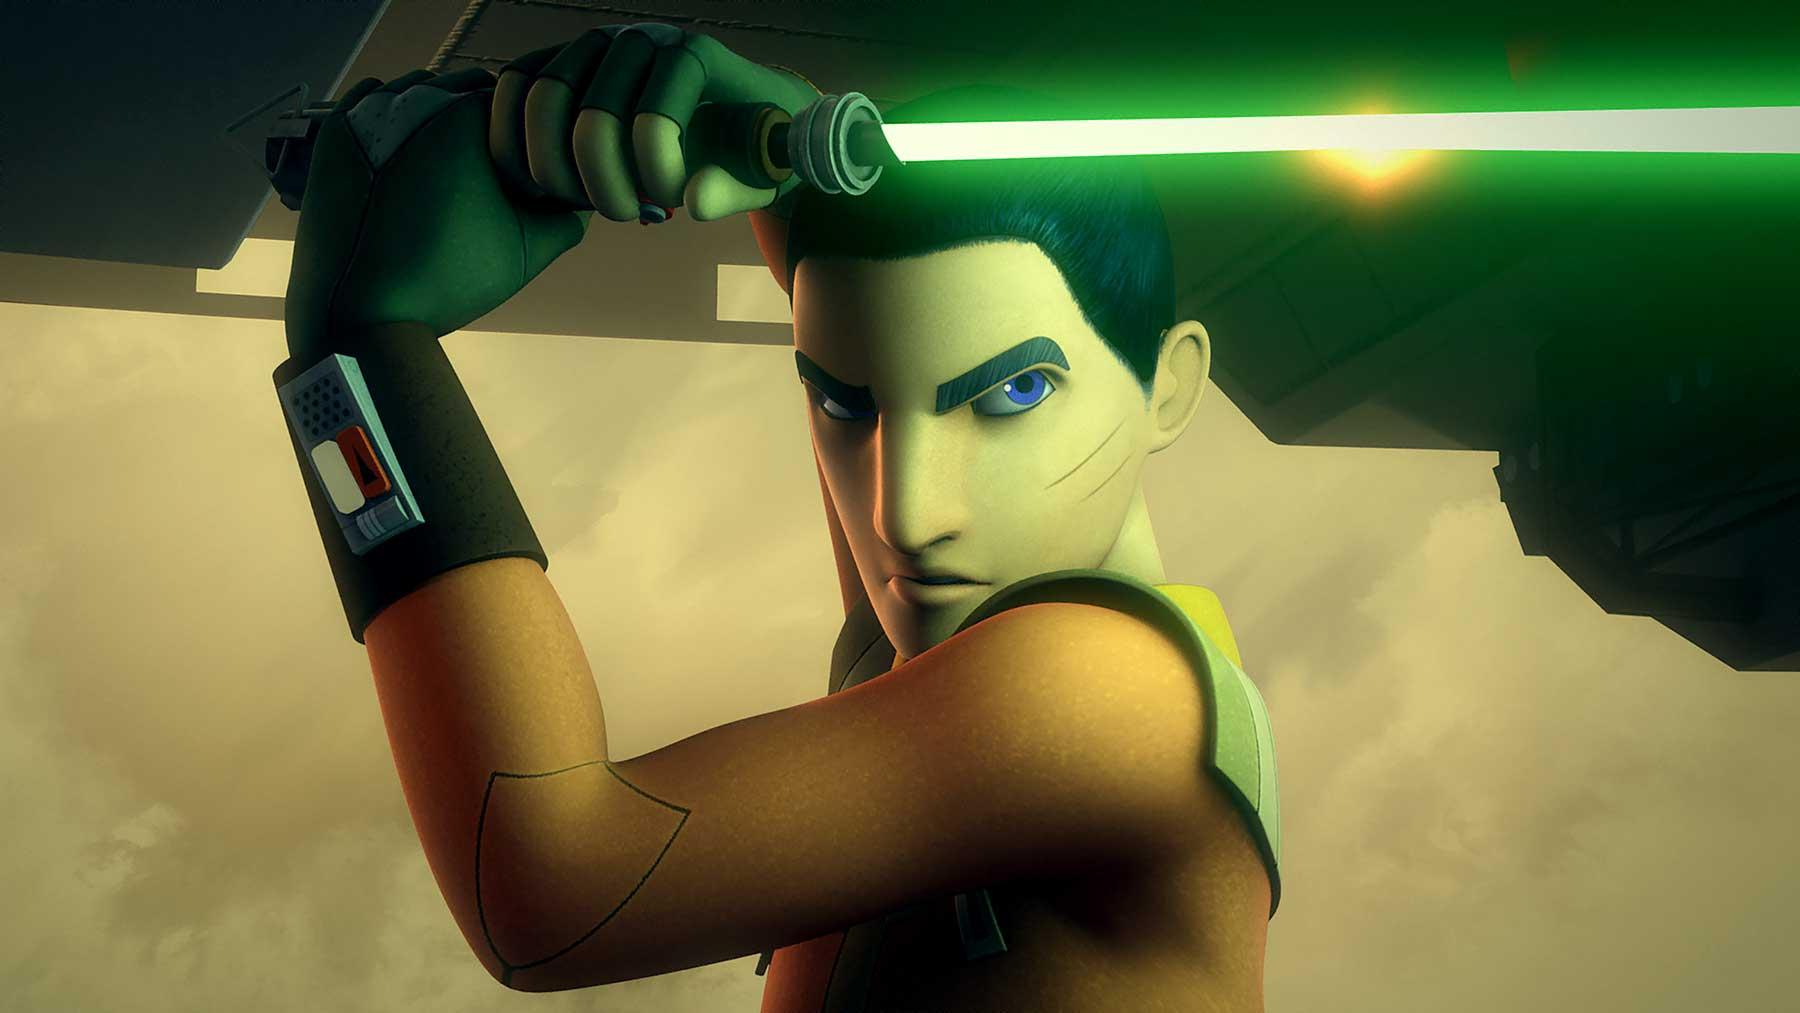 Manga adaptations of Star Wars Rebels, Leia: Princess of Alderaan coming to U.S.